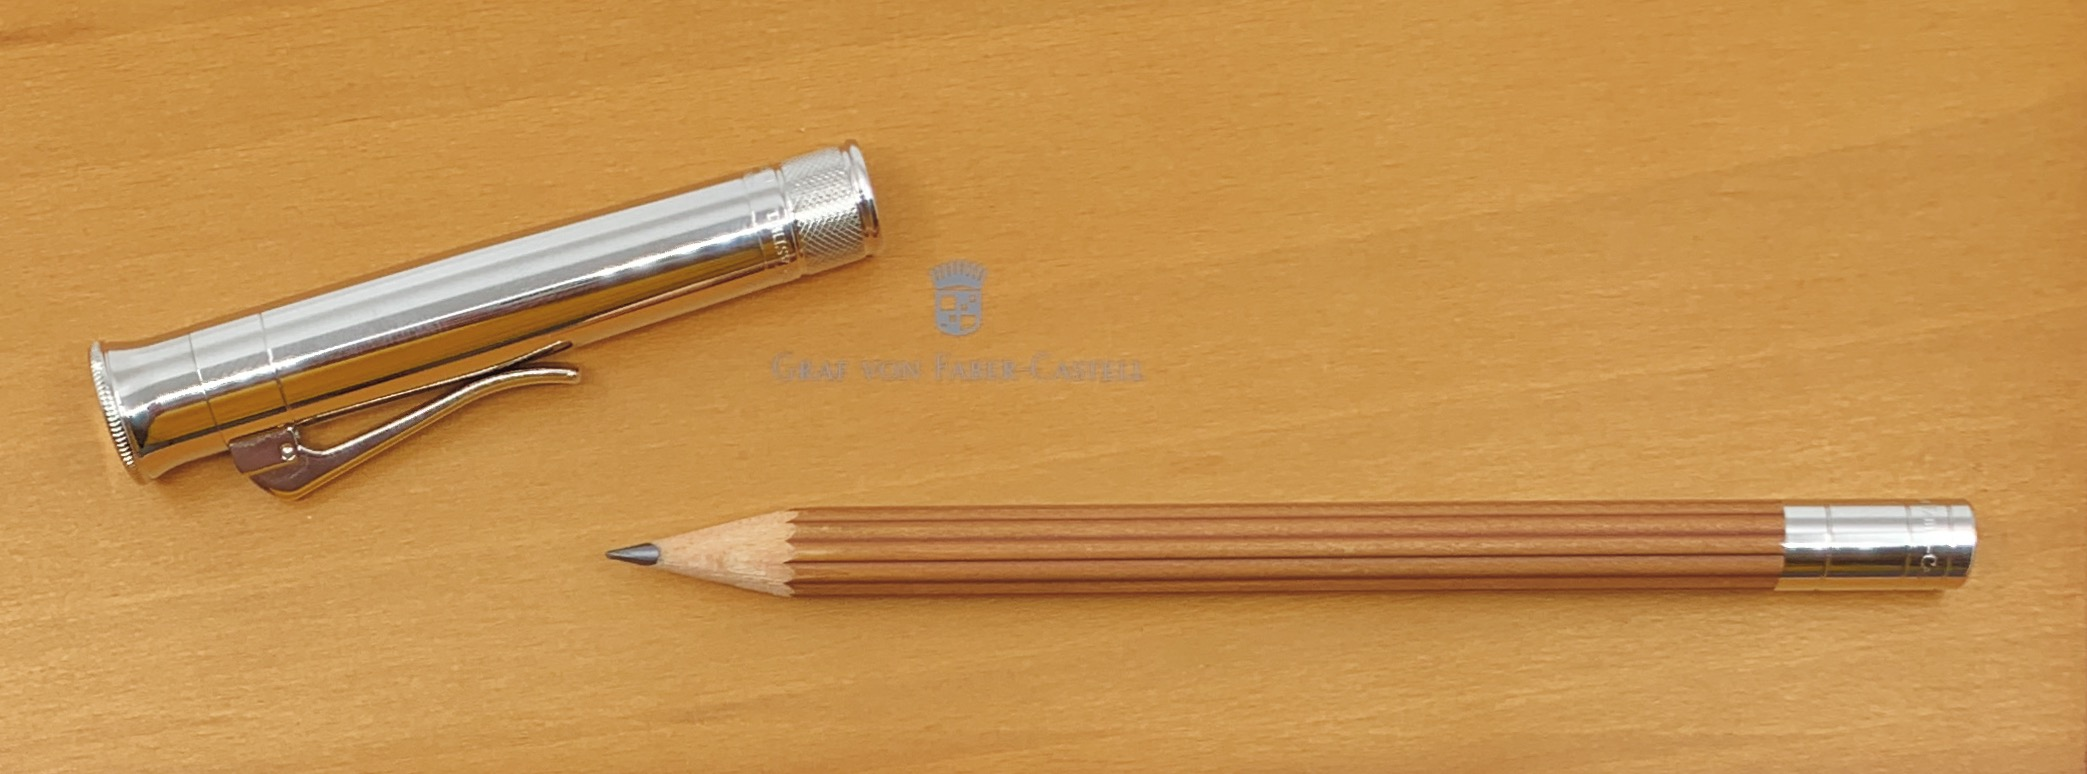 Graf von Faber-Castell Platinum-Plated Perfect Pencil